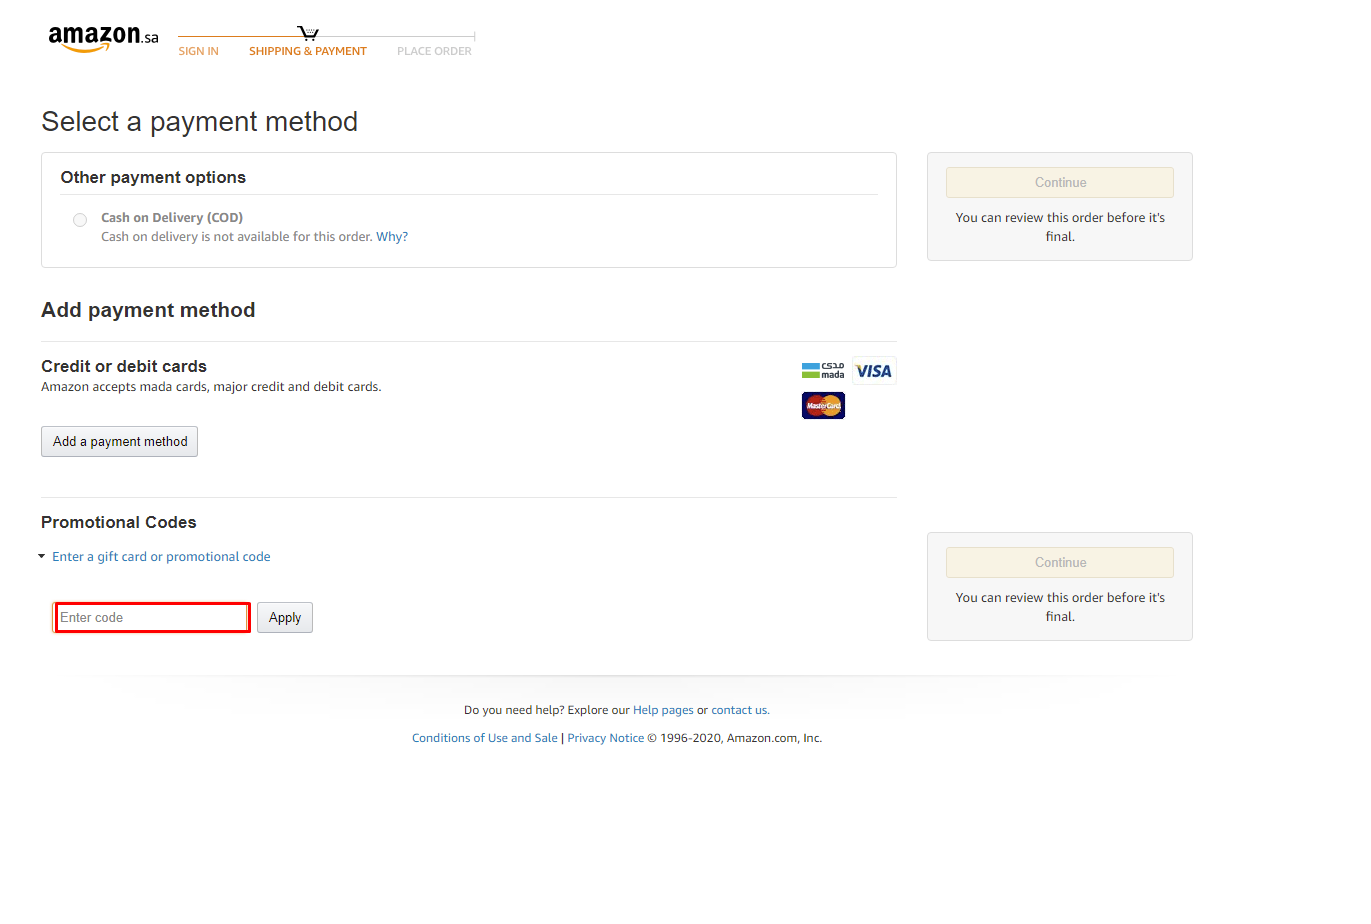 Use Amazon KSA Discount Code